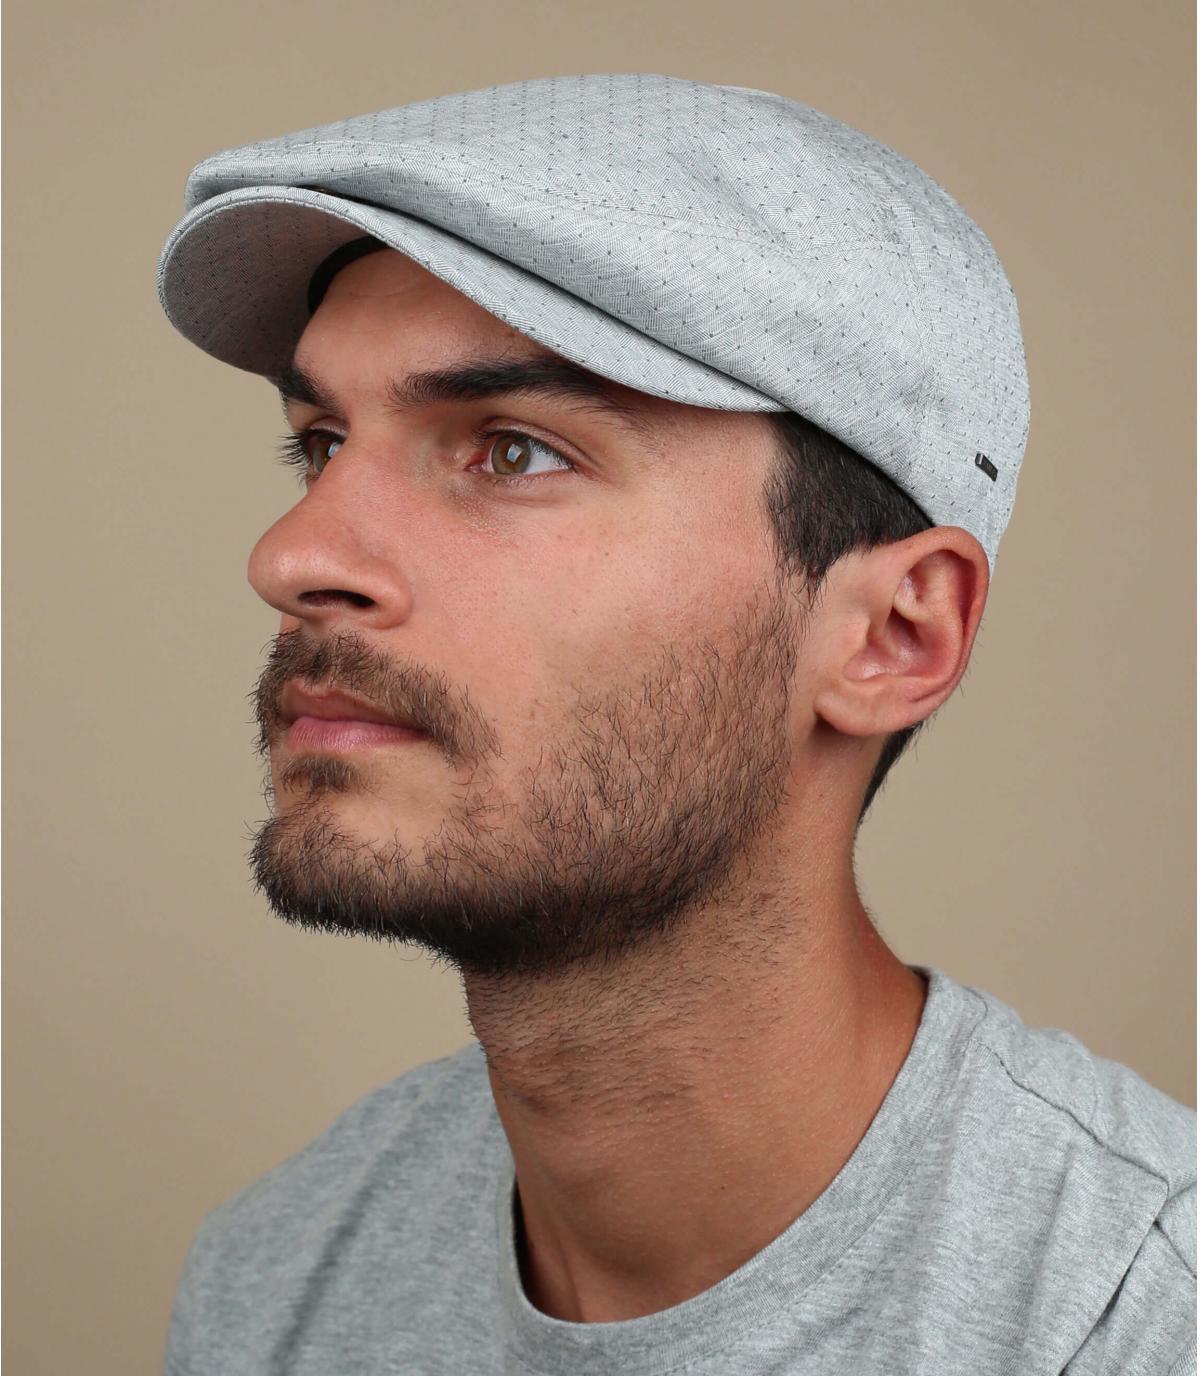 katoenen grijze baret